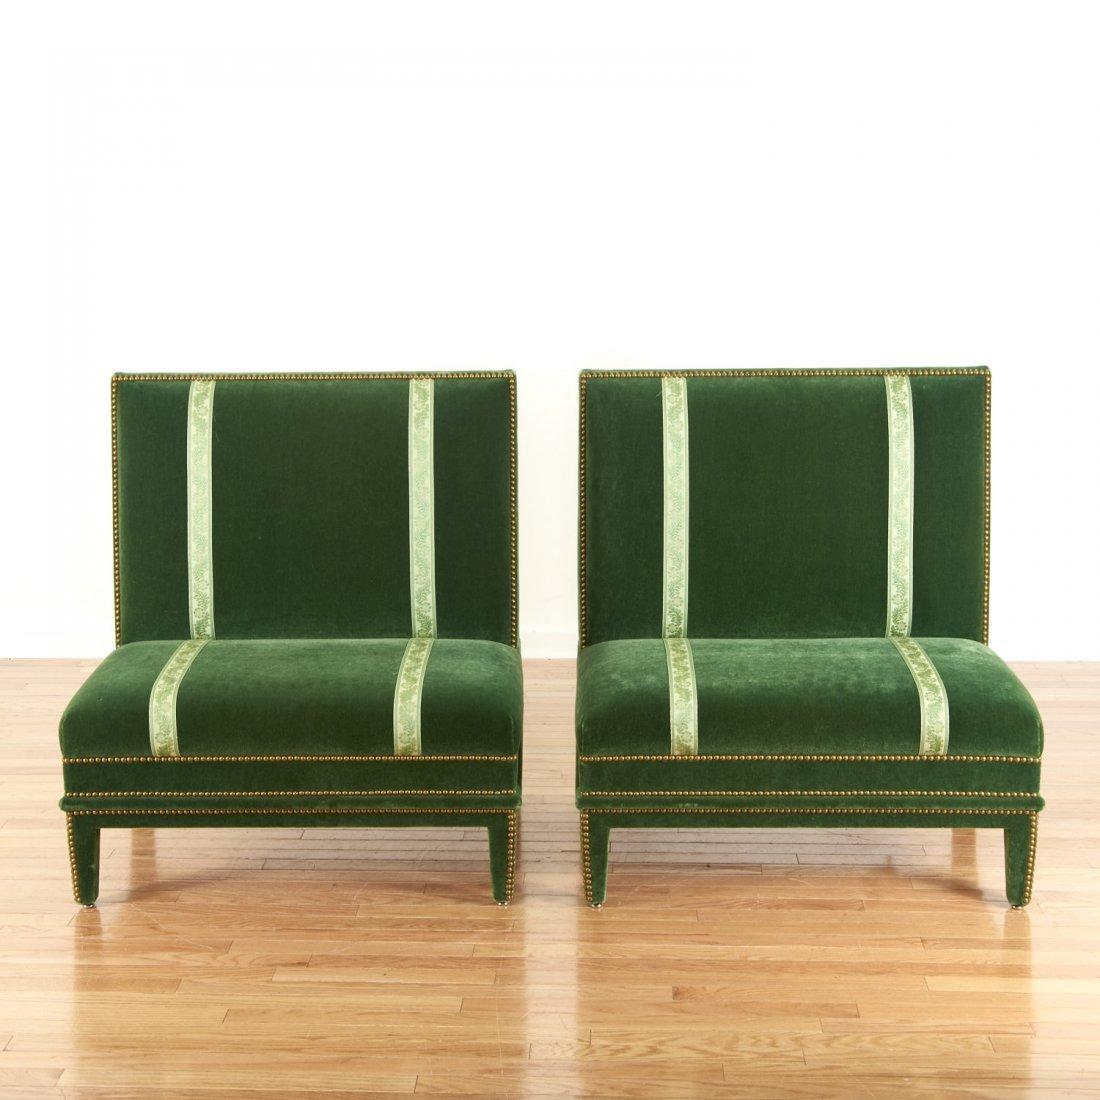 Pair Renzo Mongiardino style closed-nail velvet sofas